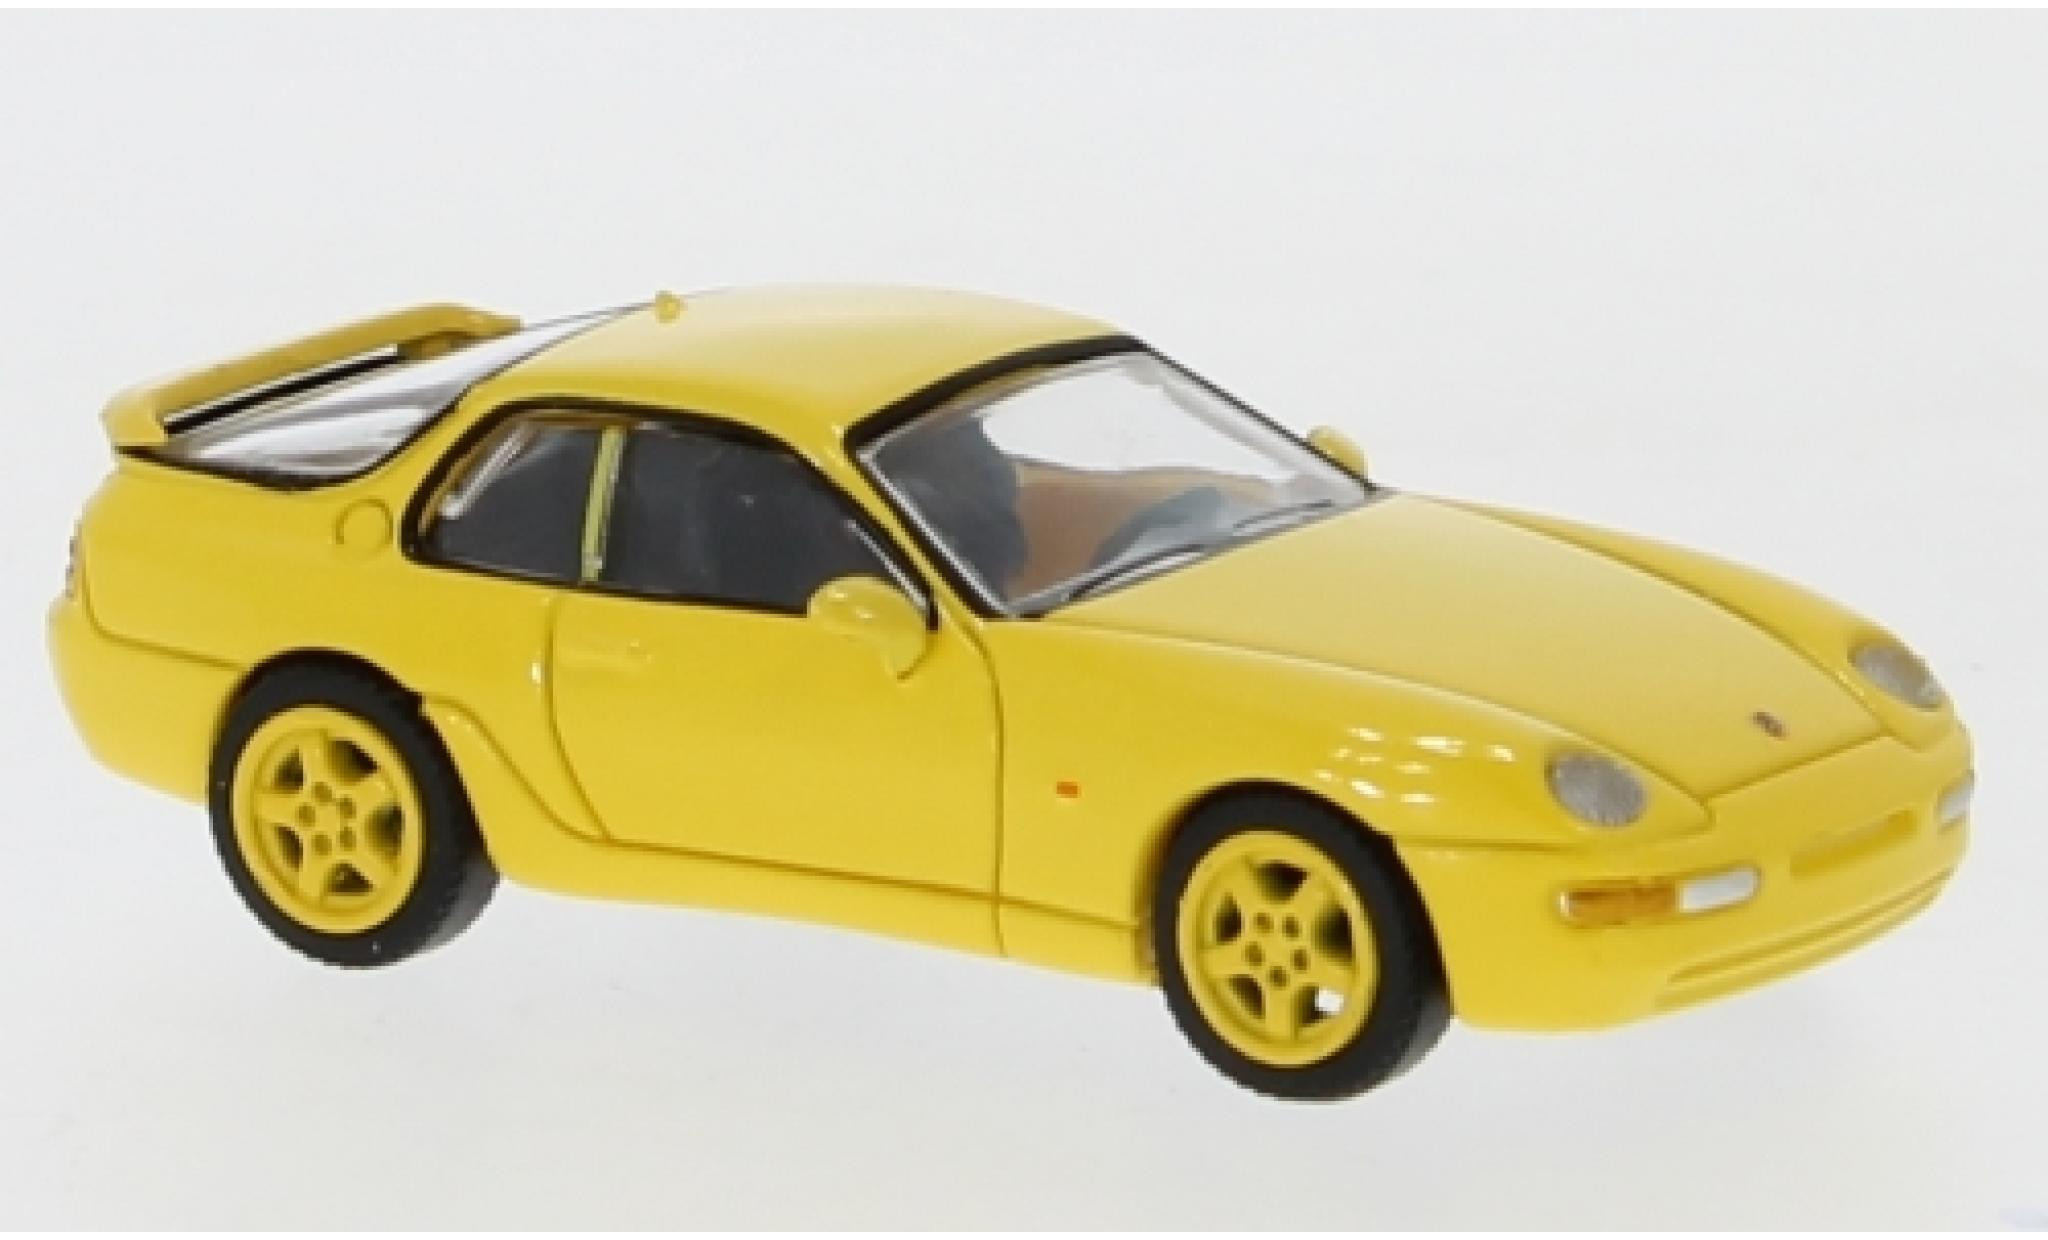 Porsche 968 1/87 Premium ClassiXXs jaune 1991